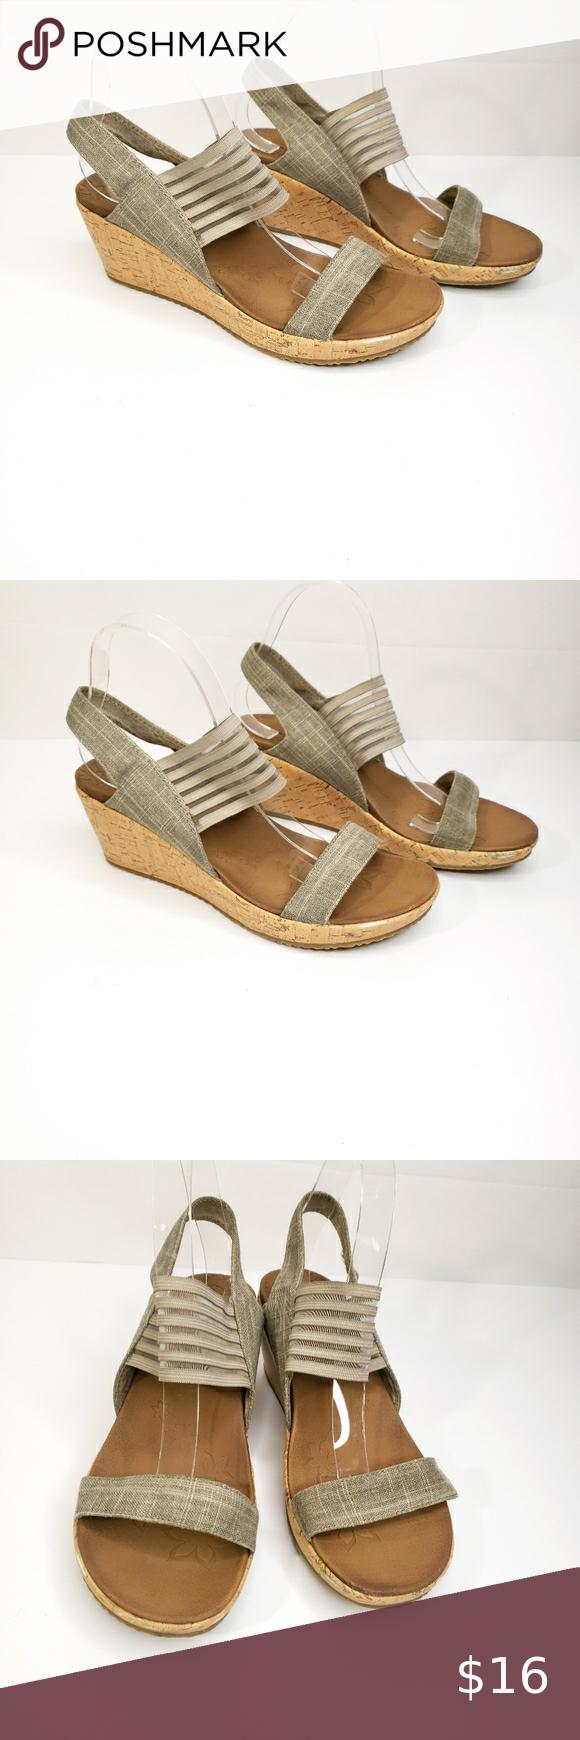 Sketchers Beverlee Smitten Wedge Sandal Size 9 Sketchers Beverlee Smitten Kitten Taupe Sandal Comfort Wedge Heel In 2020 Womens Shoes Wedges Taupe Sandals Wedge Shoes